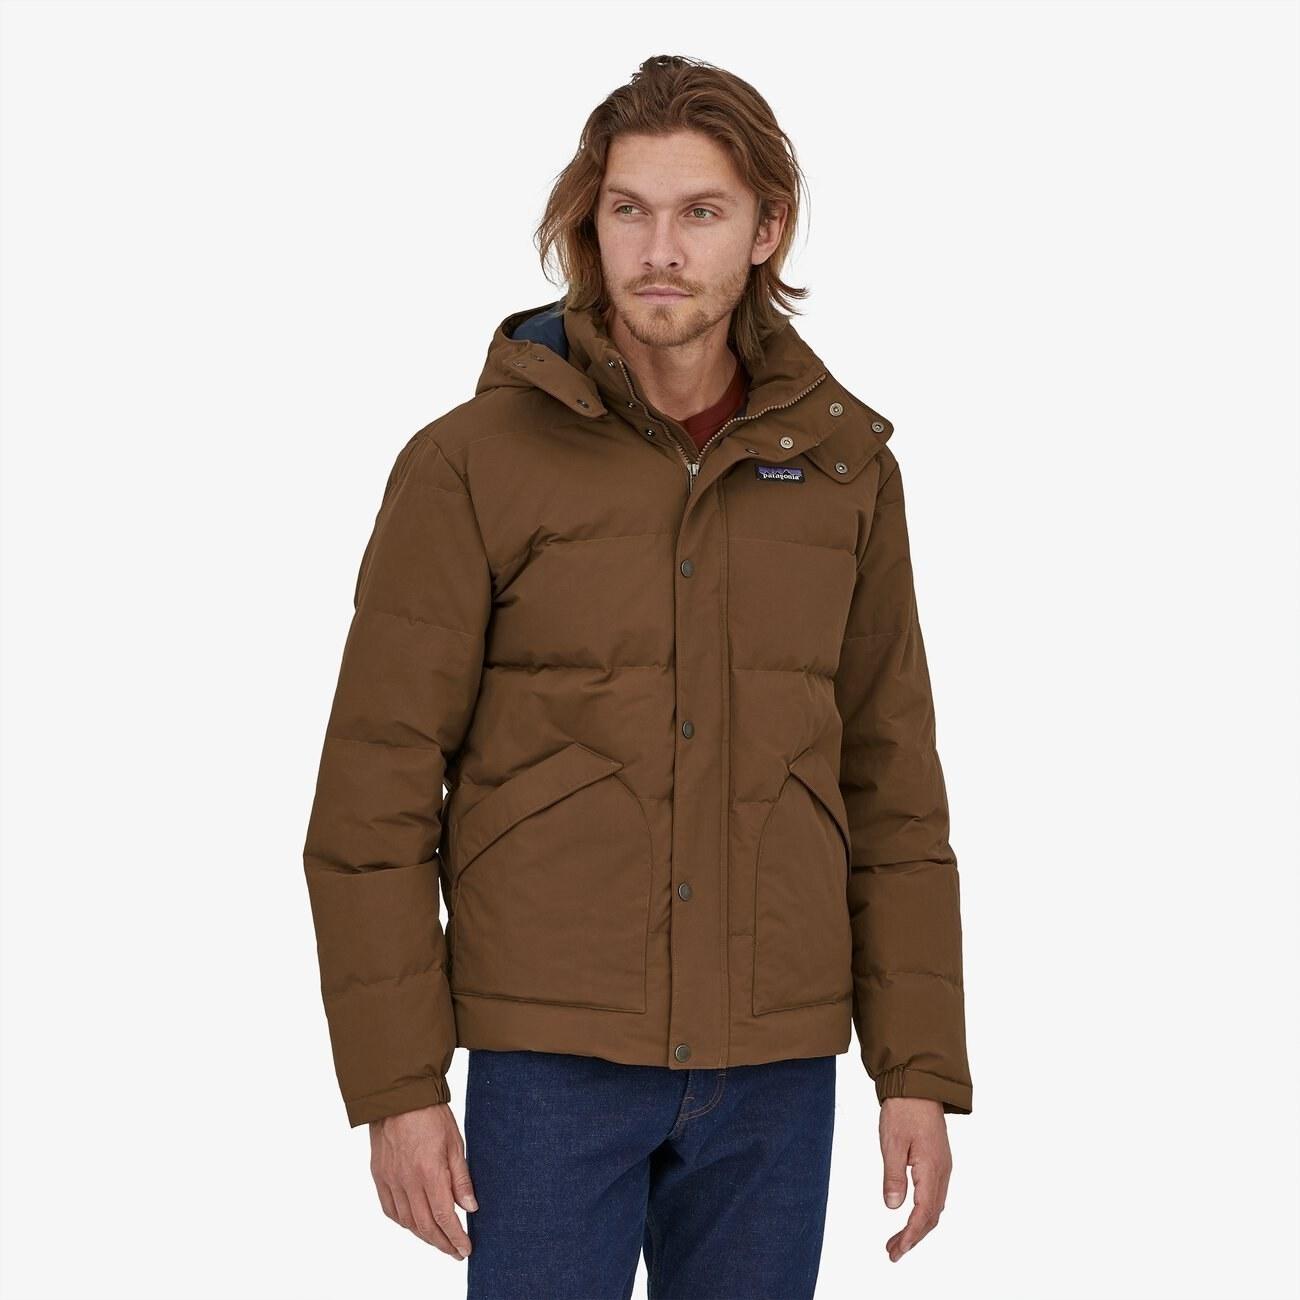 model wearing the Patagonia jacket in brown